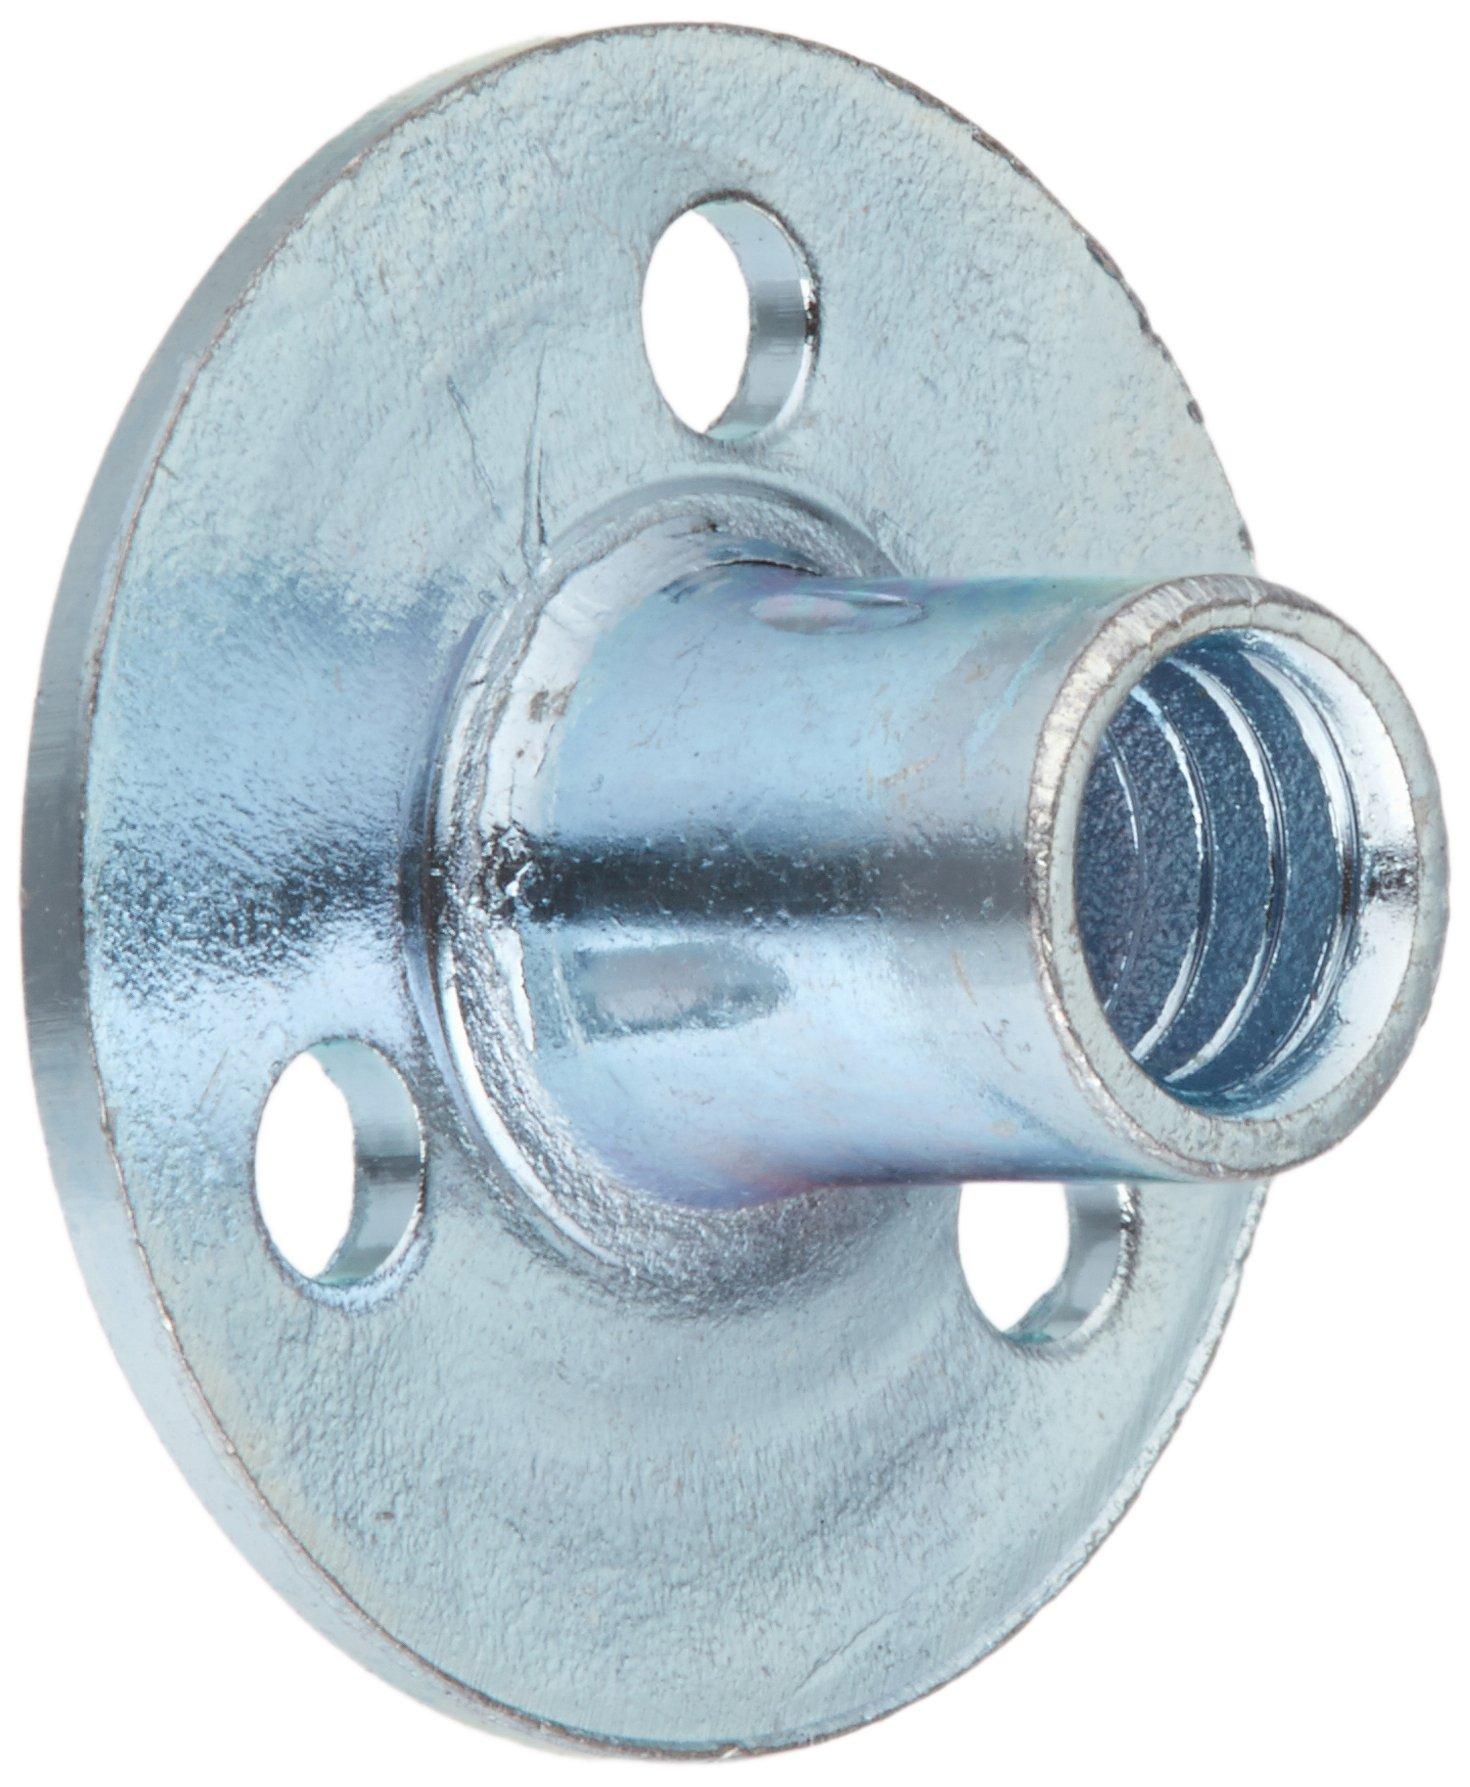 Hard-to-Find Fastener 014973323103 Brad Hole Tee Nuts, 6-32 x 1/4, Piece-20